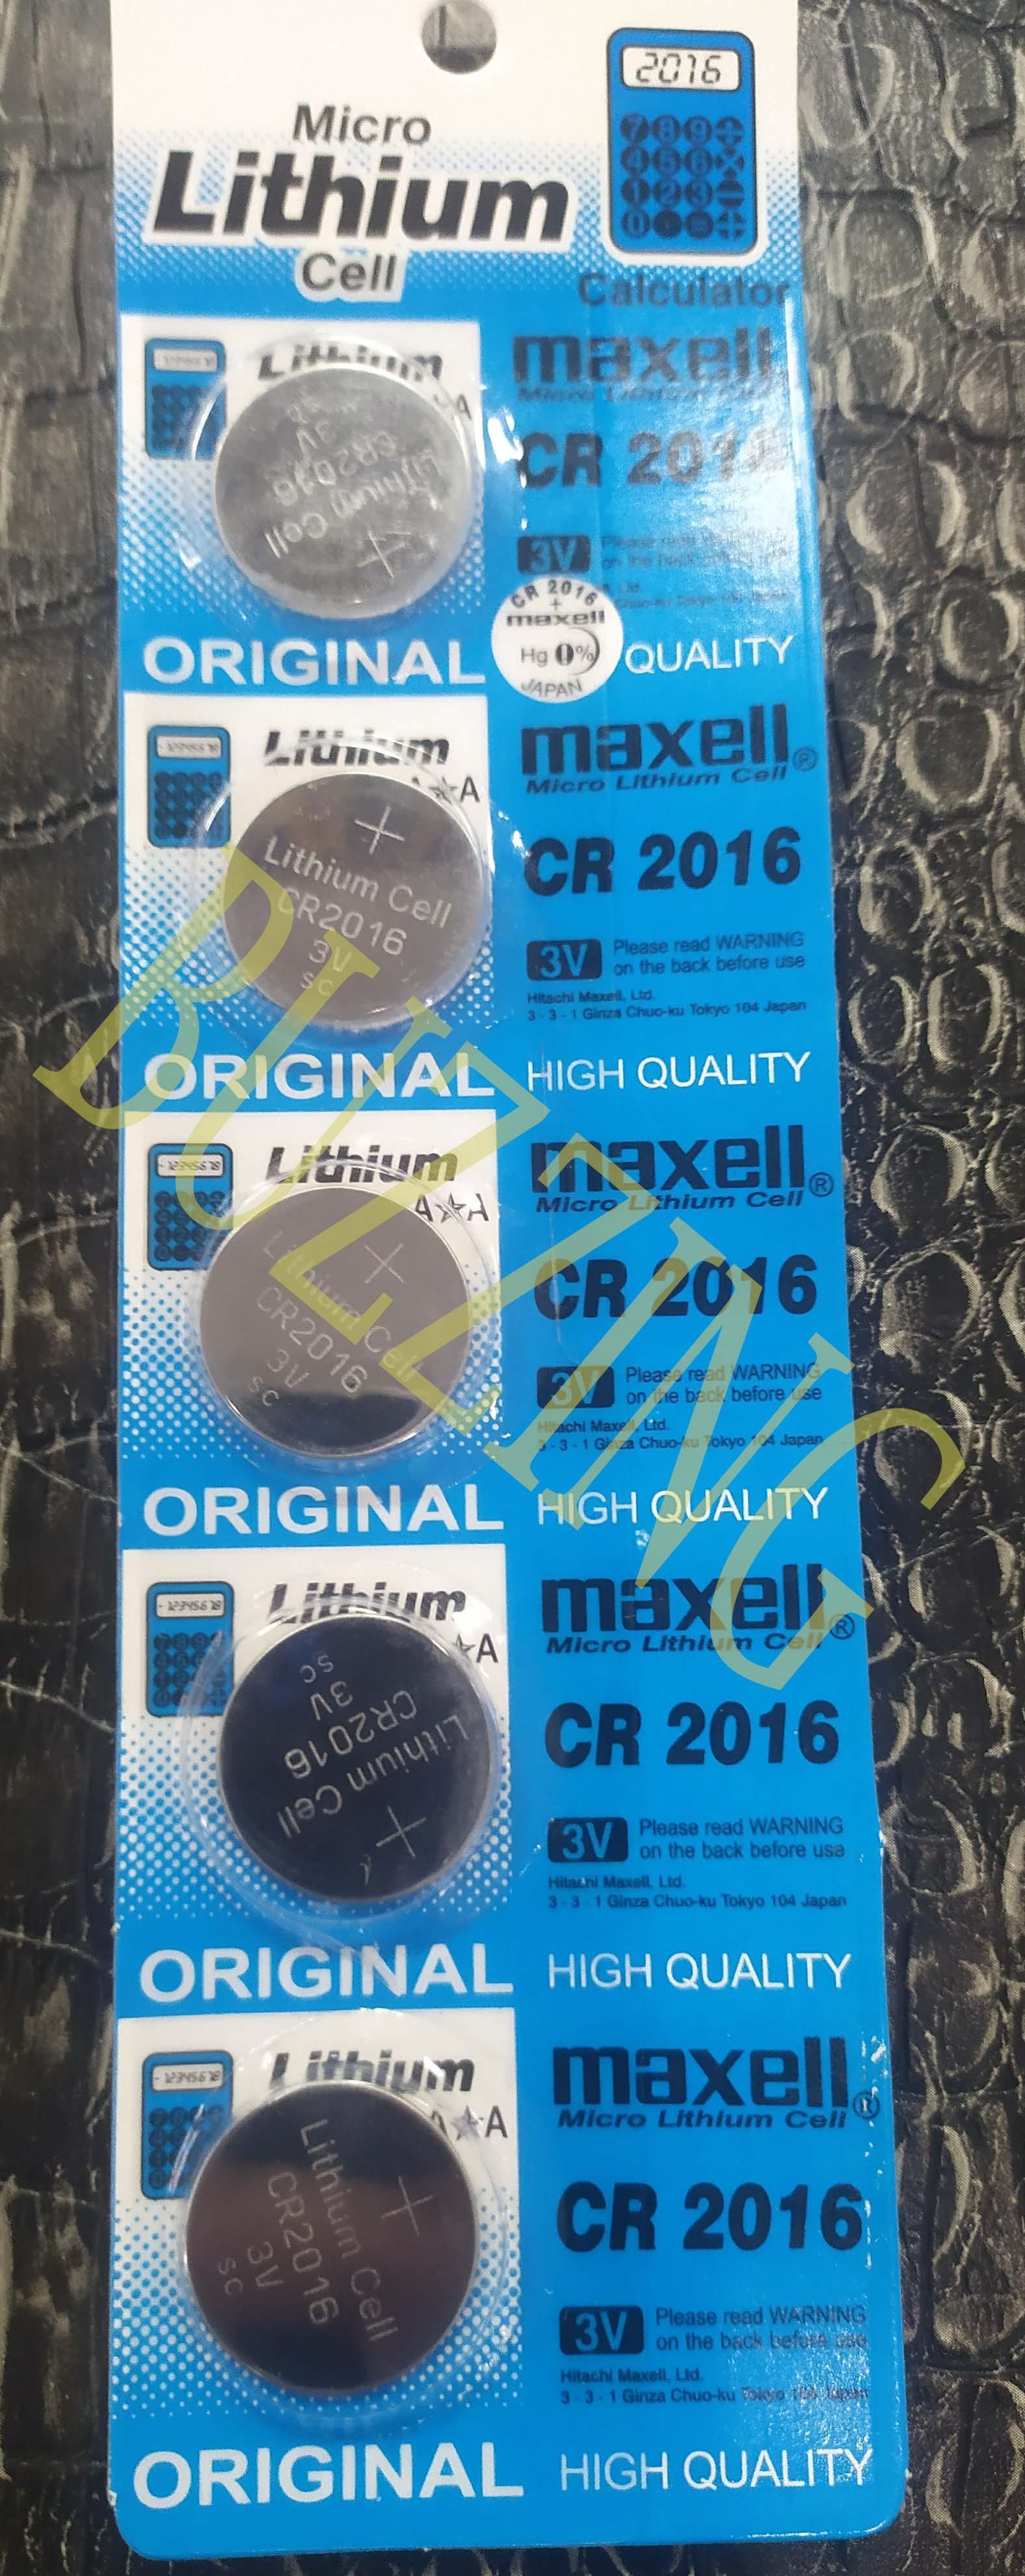 batrai jam tangan kalkulator maxell lithium cr 3v